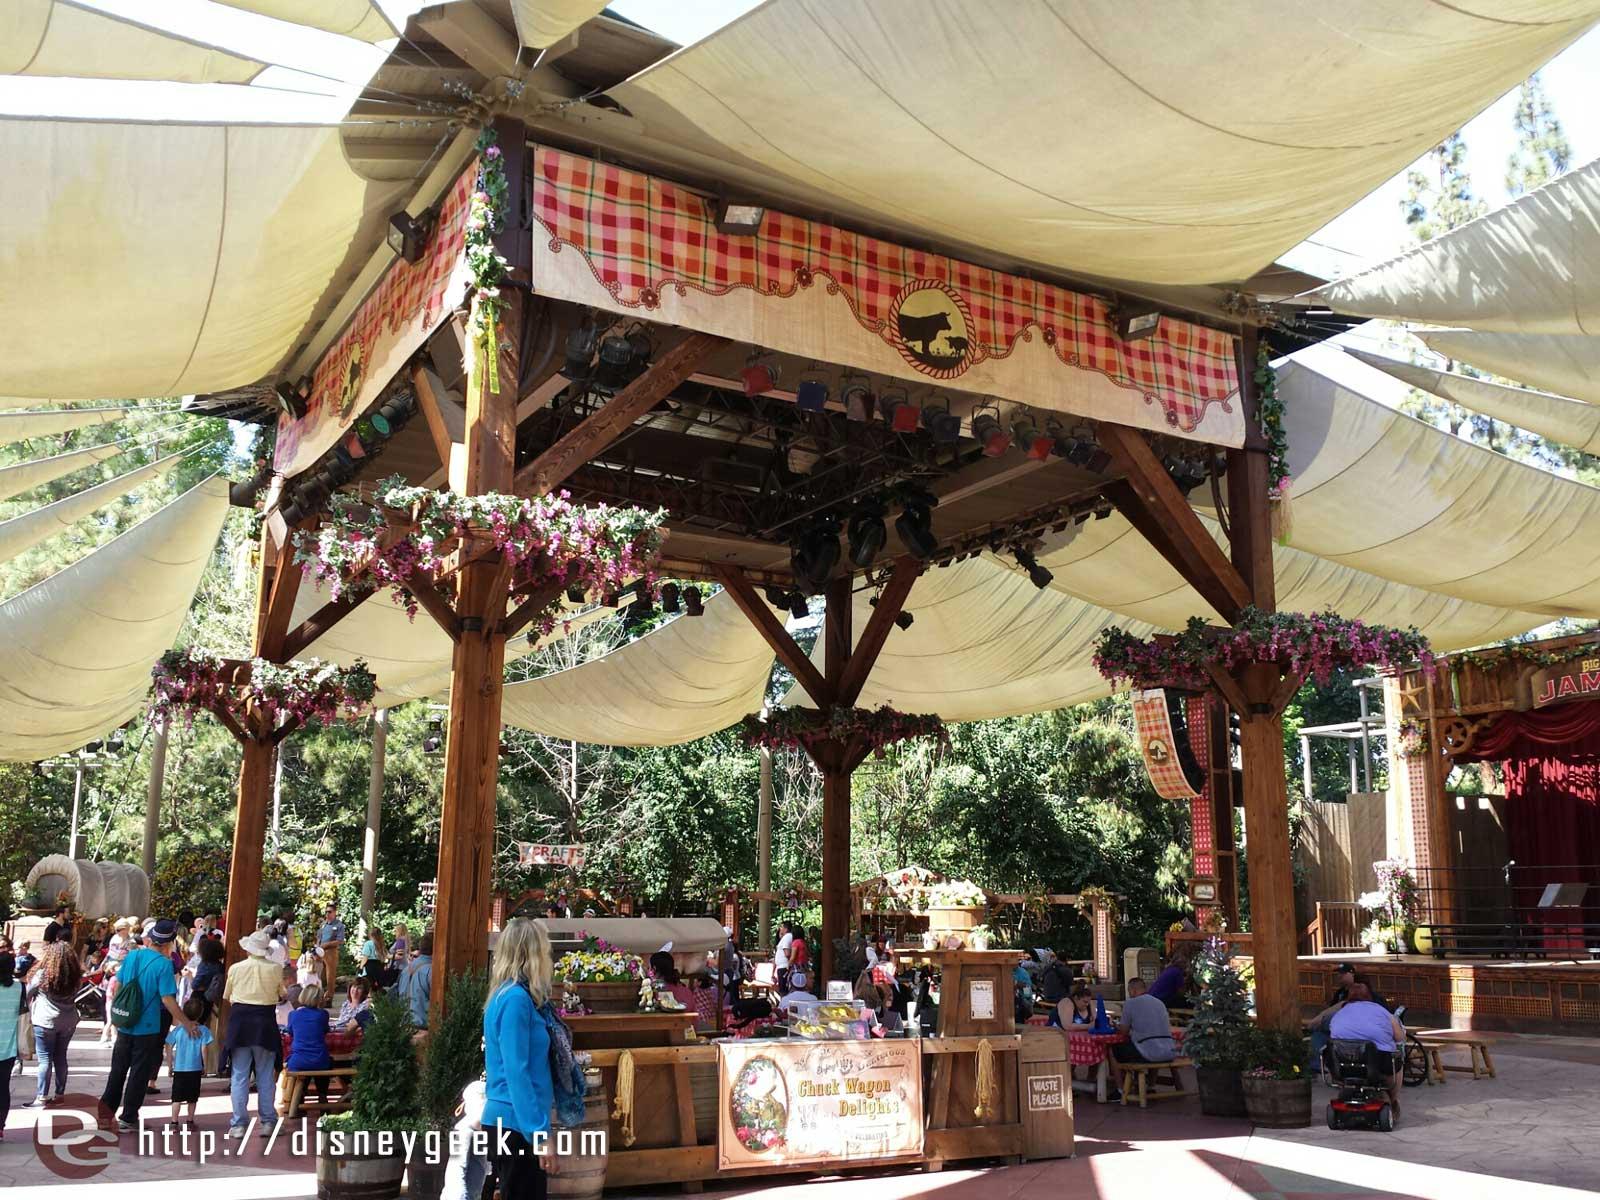 The Springtime Roundup kicks off today at the Big Thunder Ranch Jamboree #Disneyland